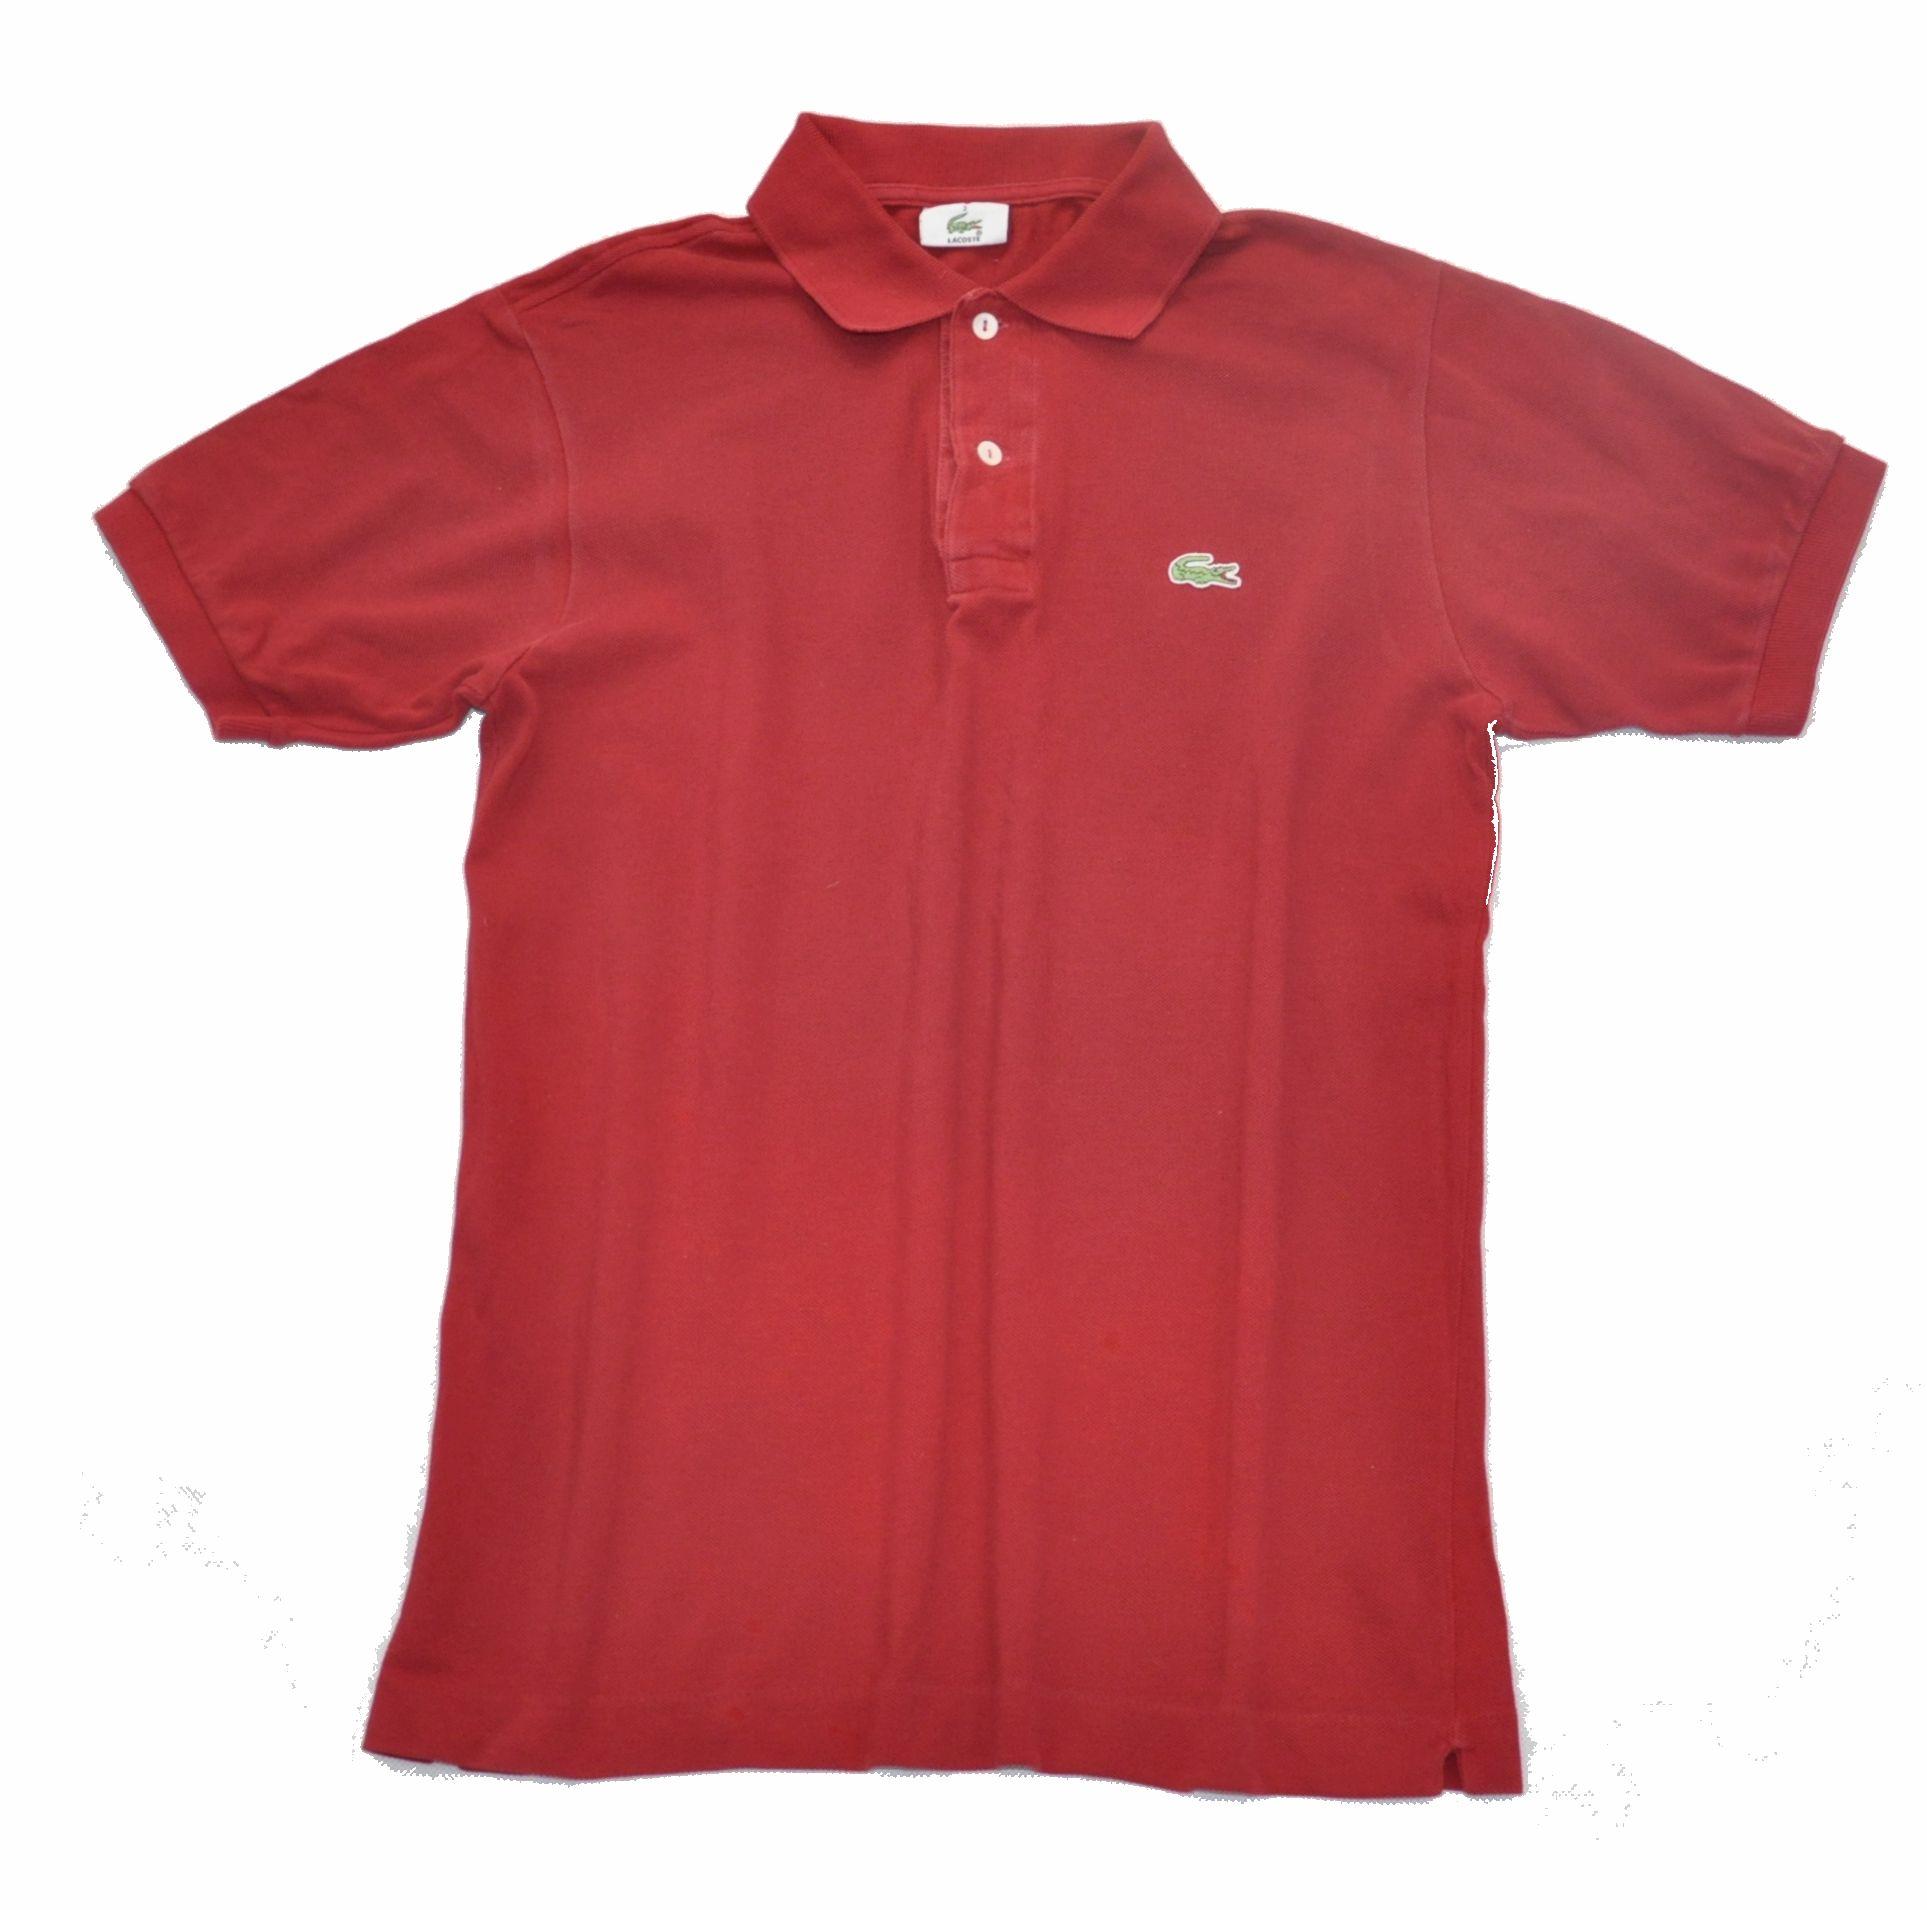 e01d15002 LACOSTE Bluzka koszulka polo czerwona męska 3 jakM ...